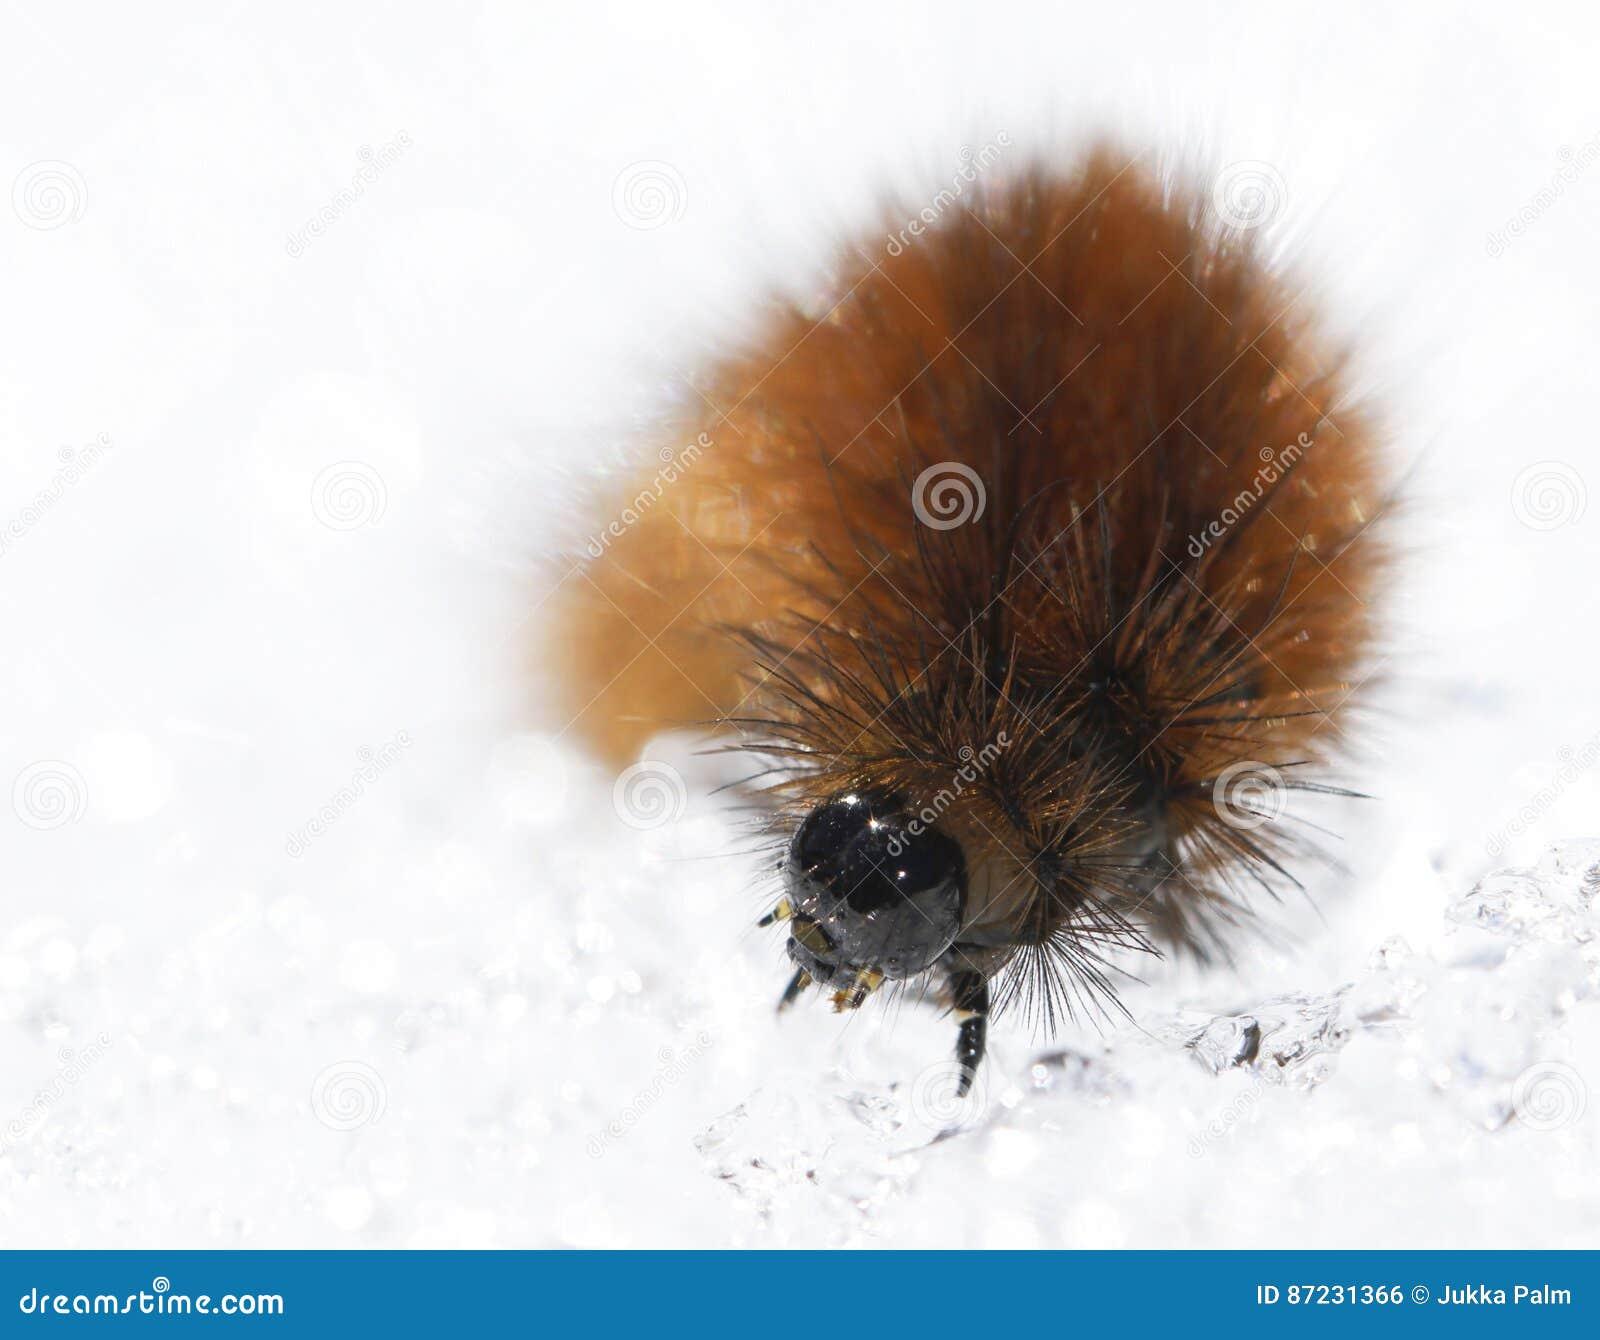 Ruby tiger caterpillar